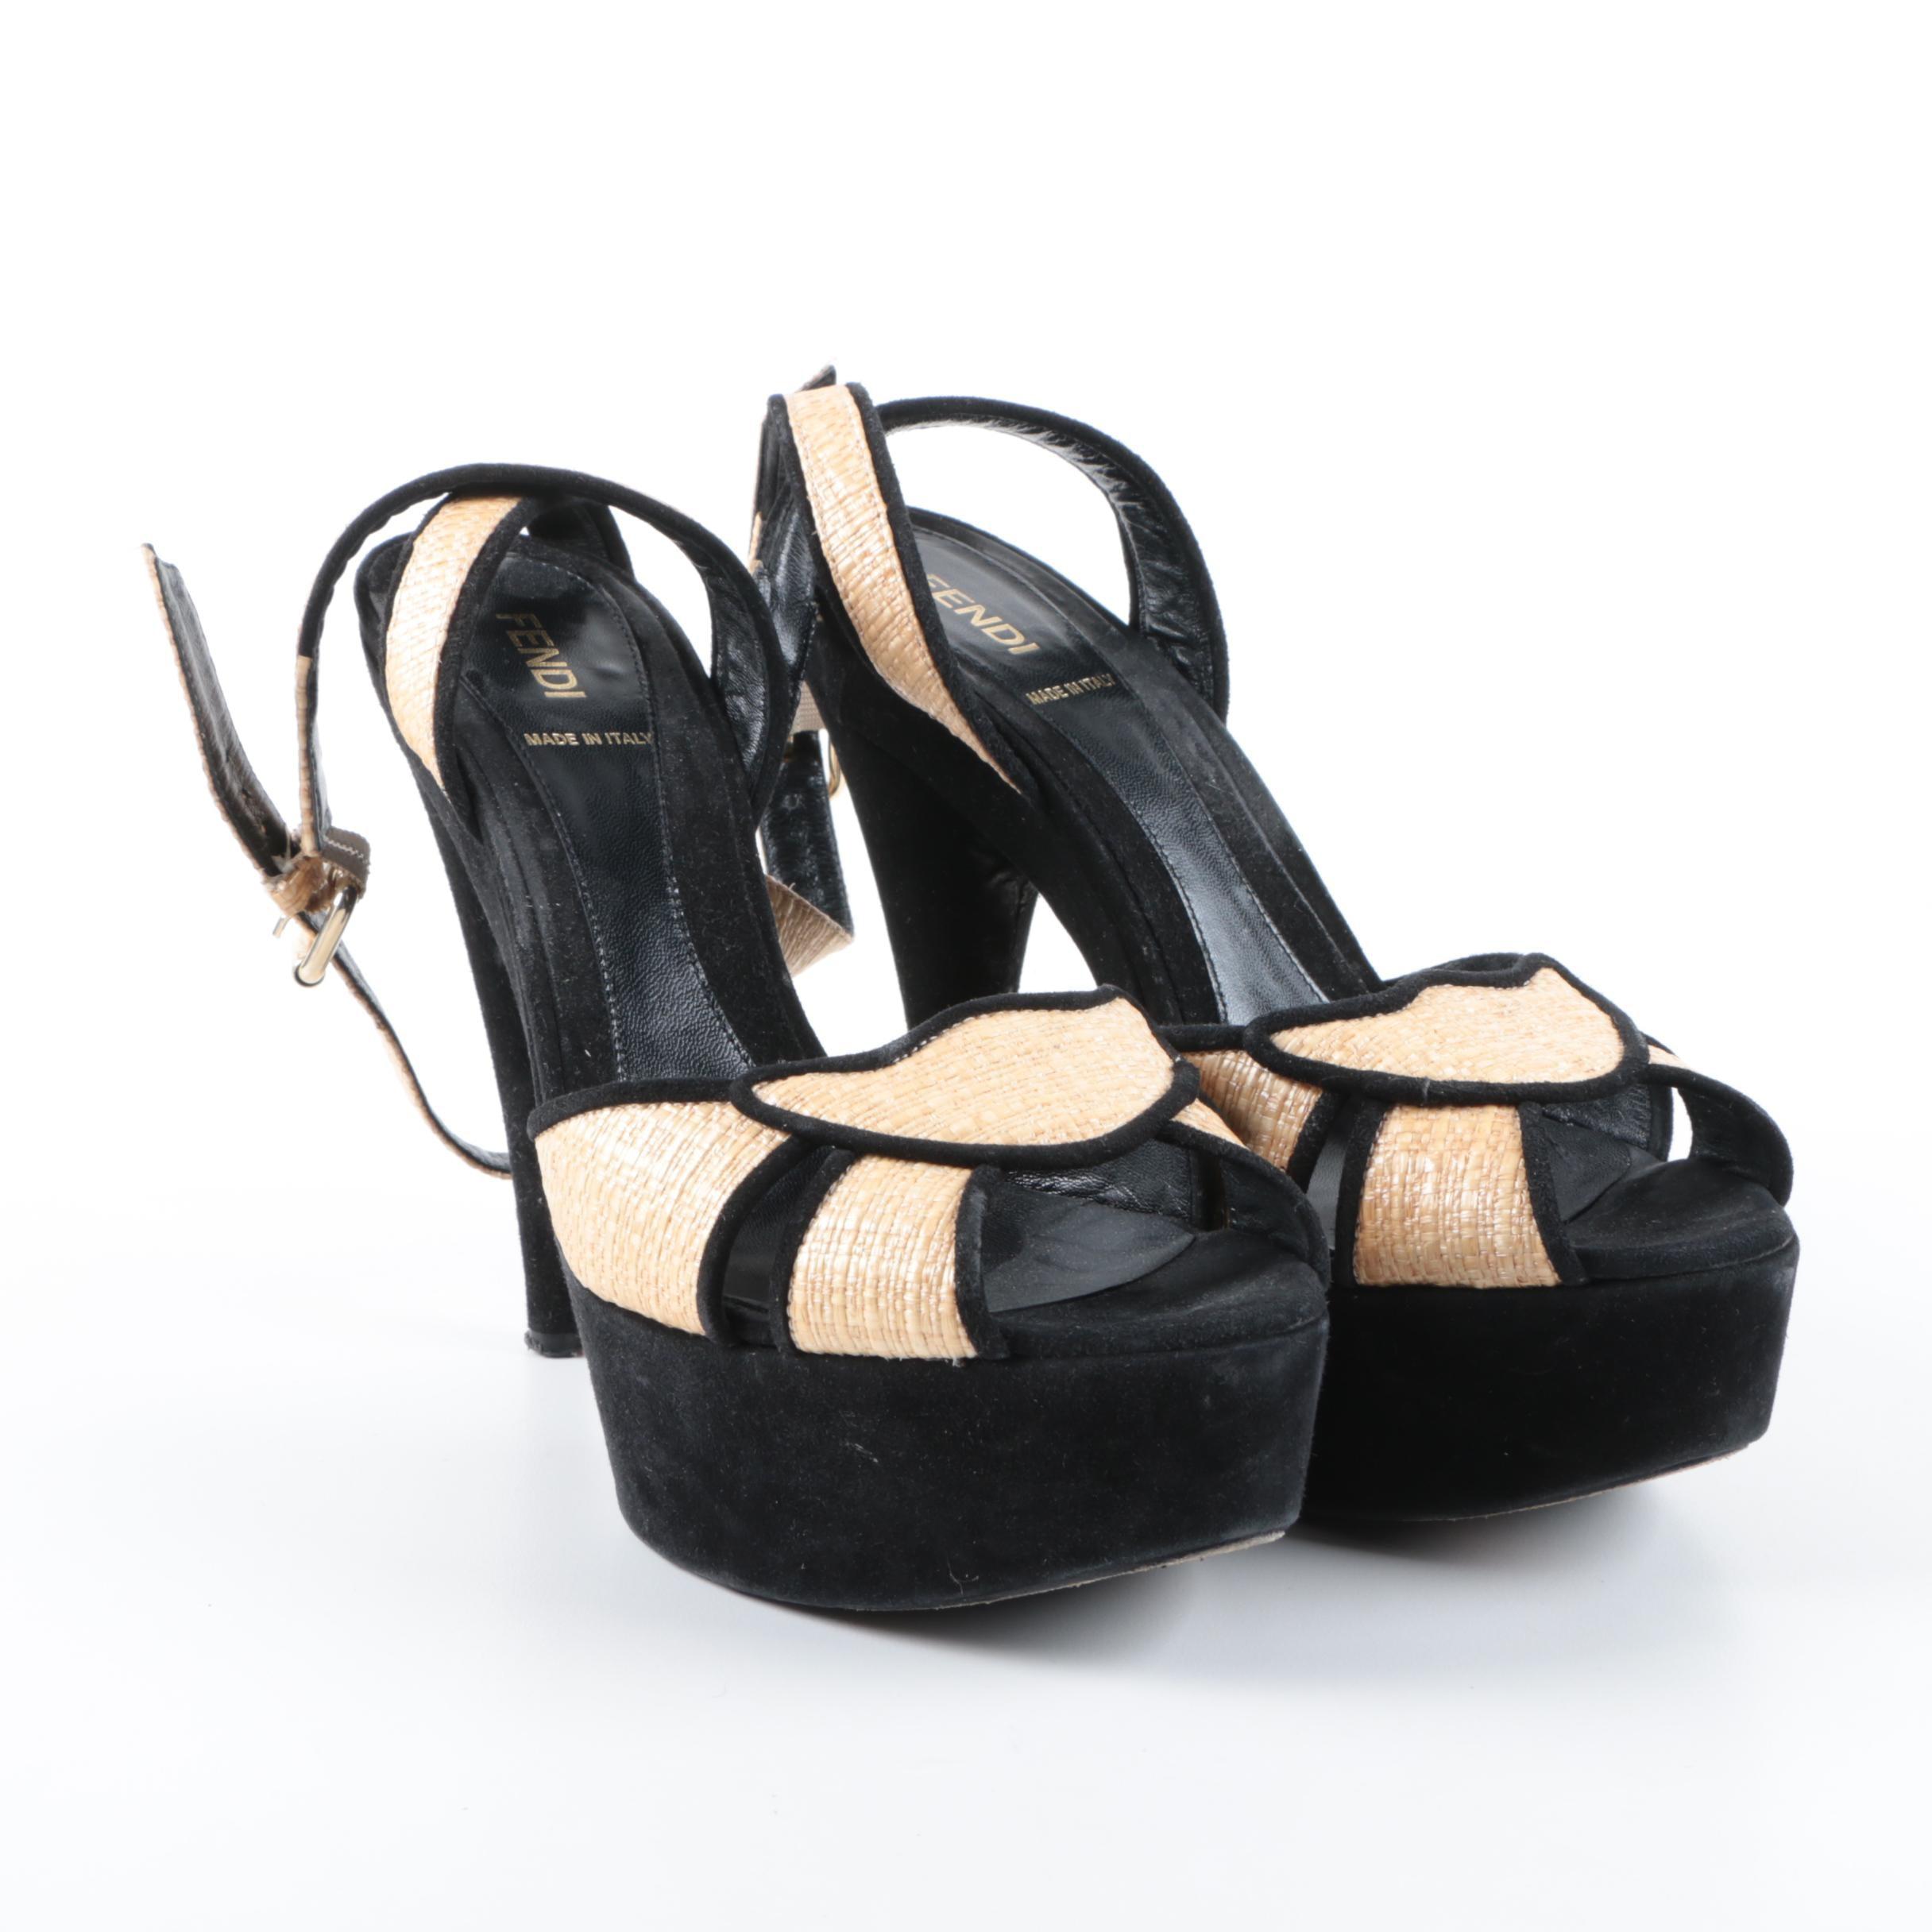 Fendi Black Suede and Raffia Ankle Strap Platform Heels